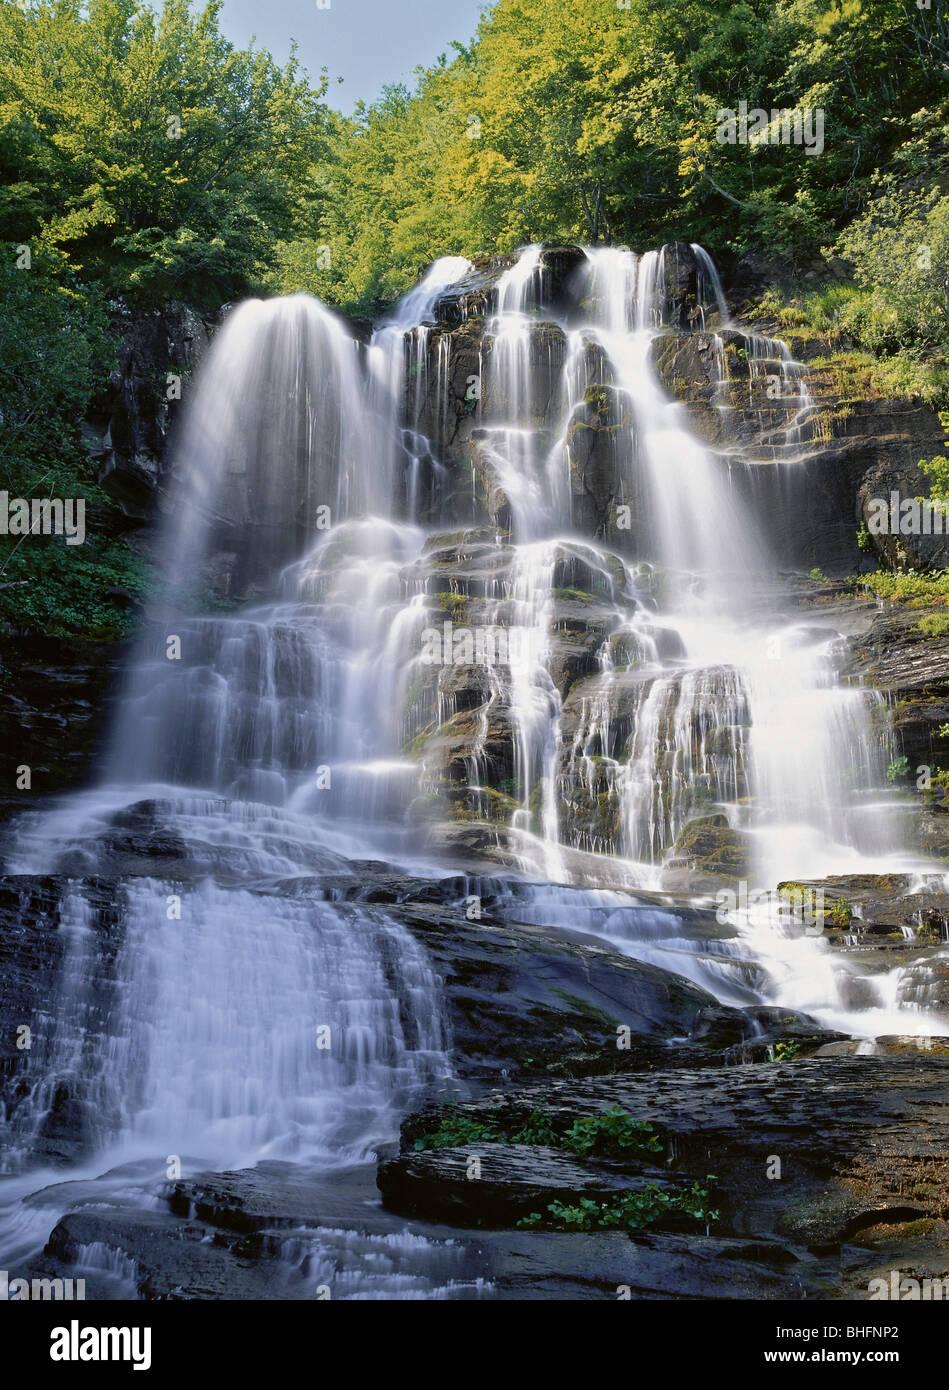 Geografía / viajes, Italia, Toscana, paisajes Doccione Falls, cerca Fellicarolo, Additional-Rights-Clearance Imagen De Stock